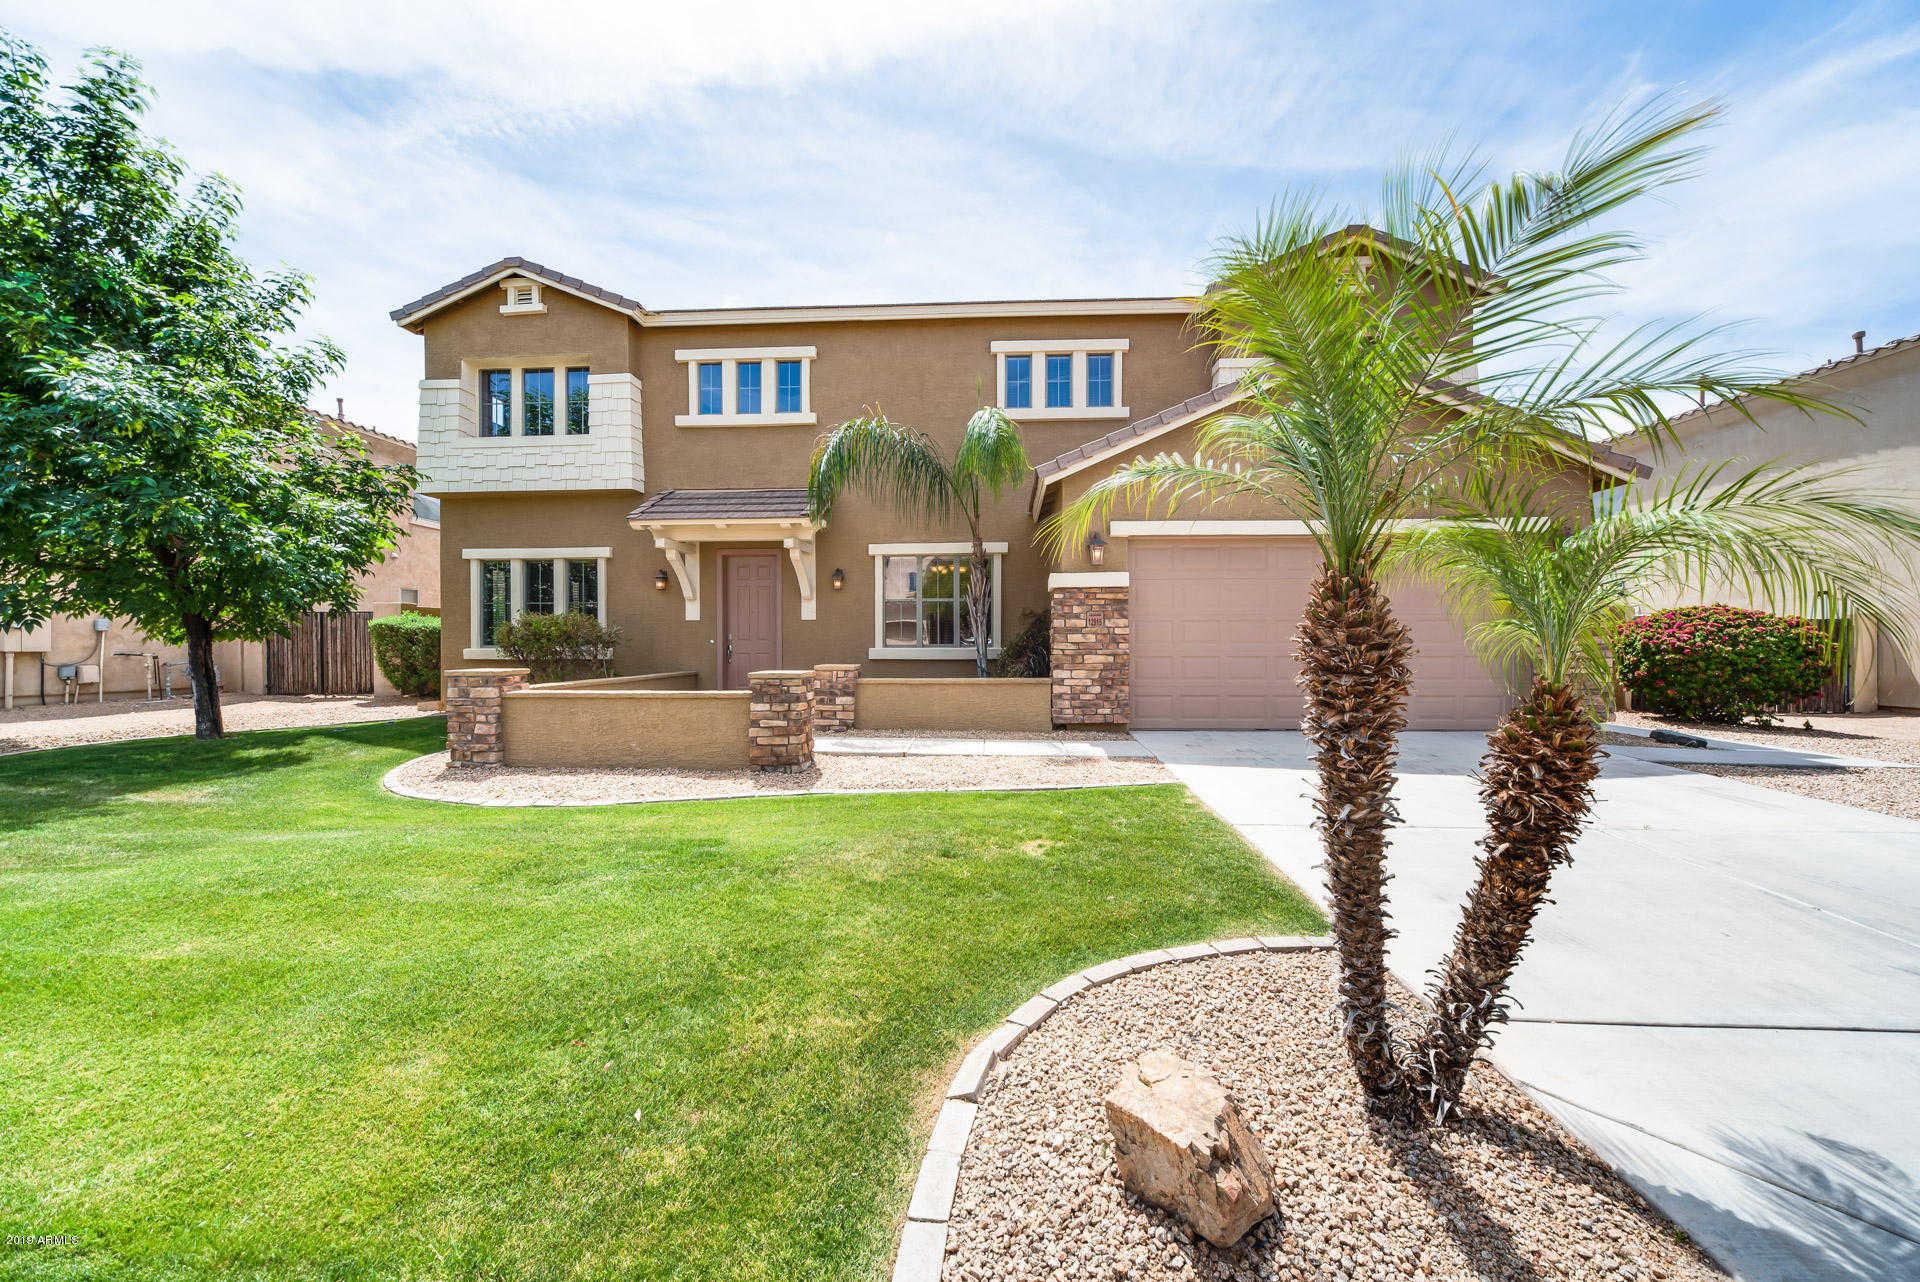 $482,900 - 5Br/4Ba - Home for Sale in Capistrano South, Glendale